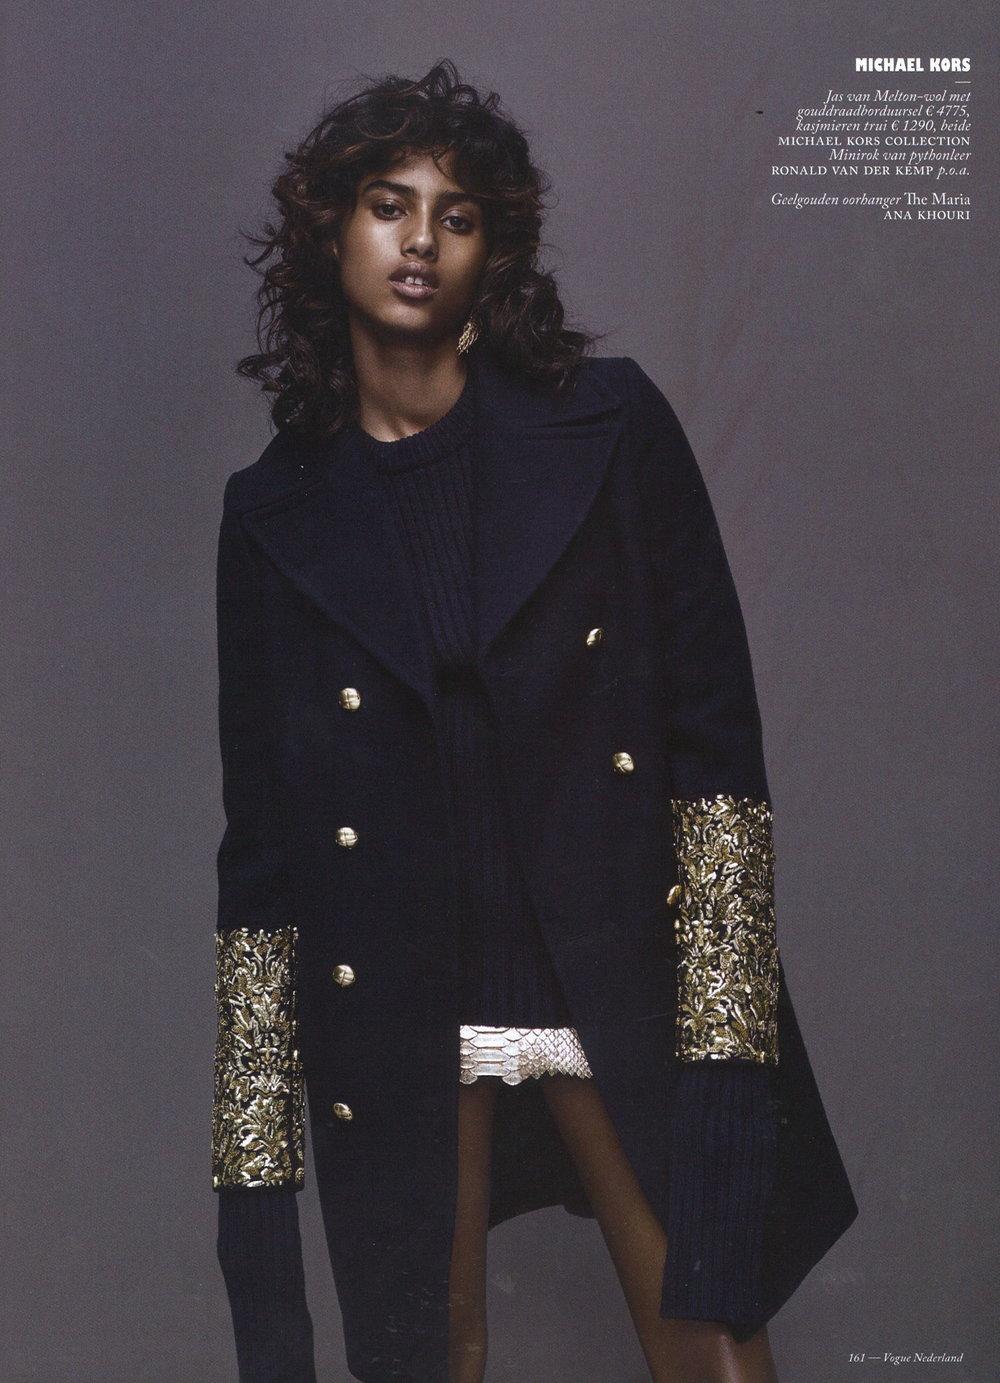 Vogue Netherlands 1